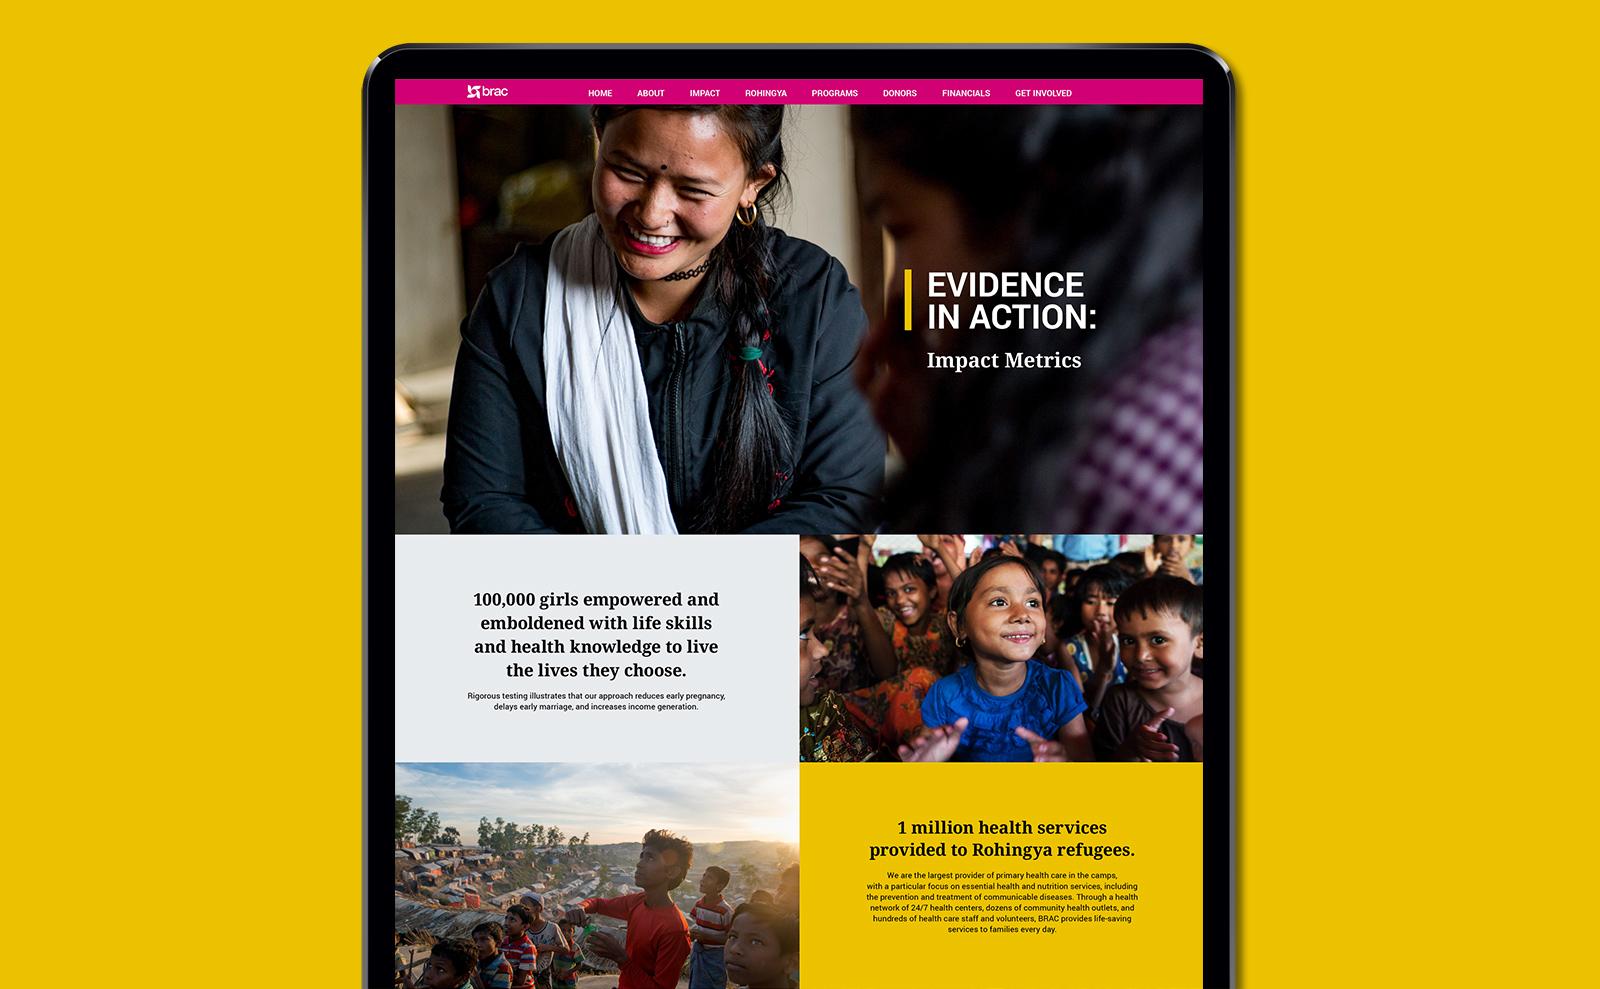 BRAC Annual Report website layout design on yellow